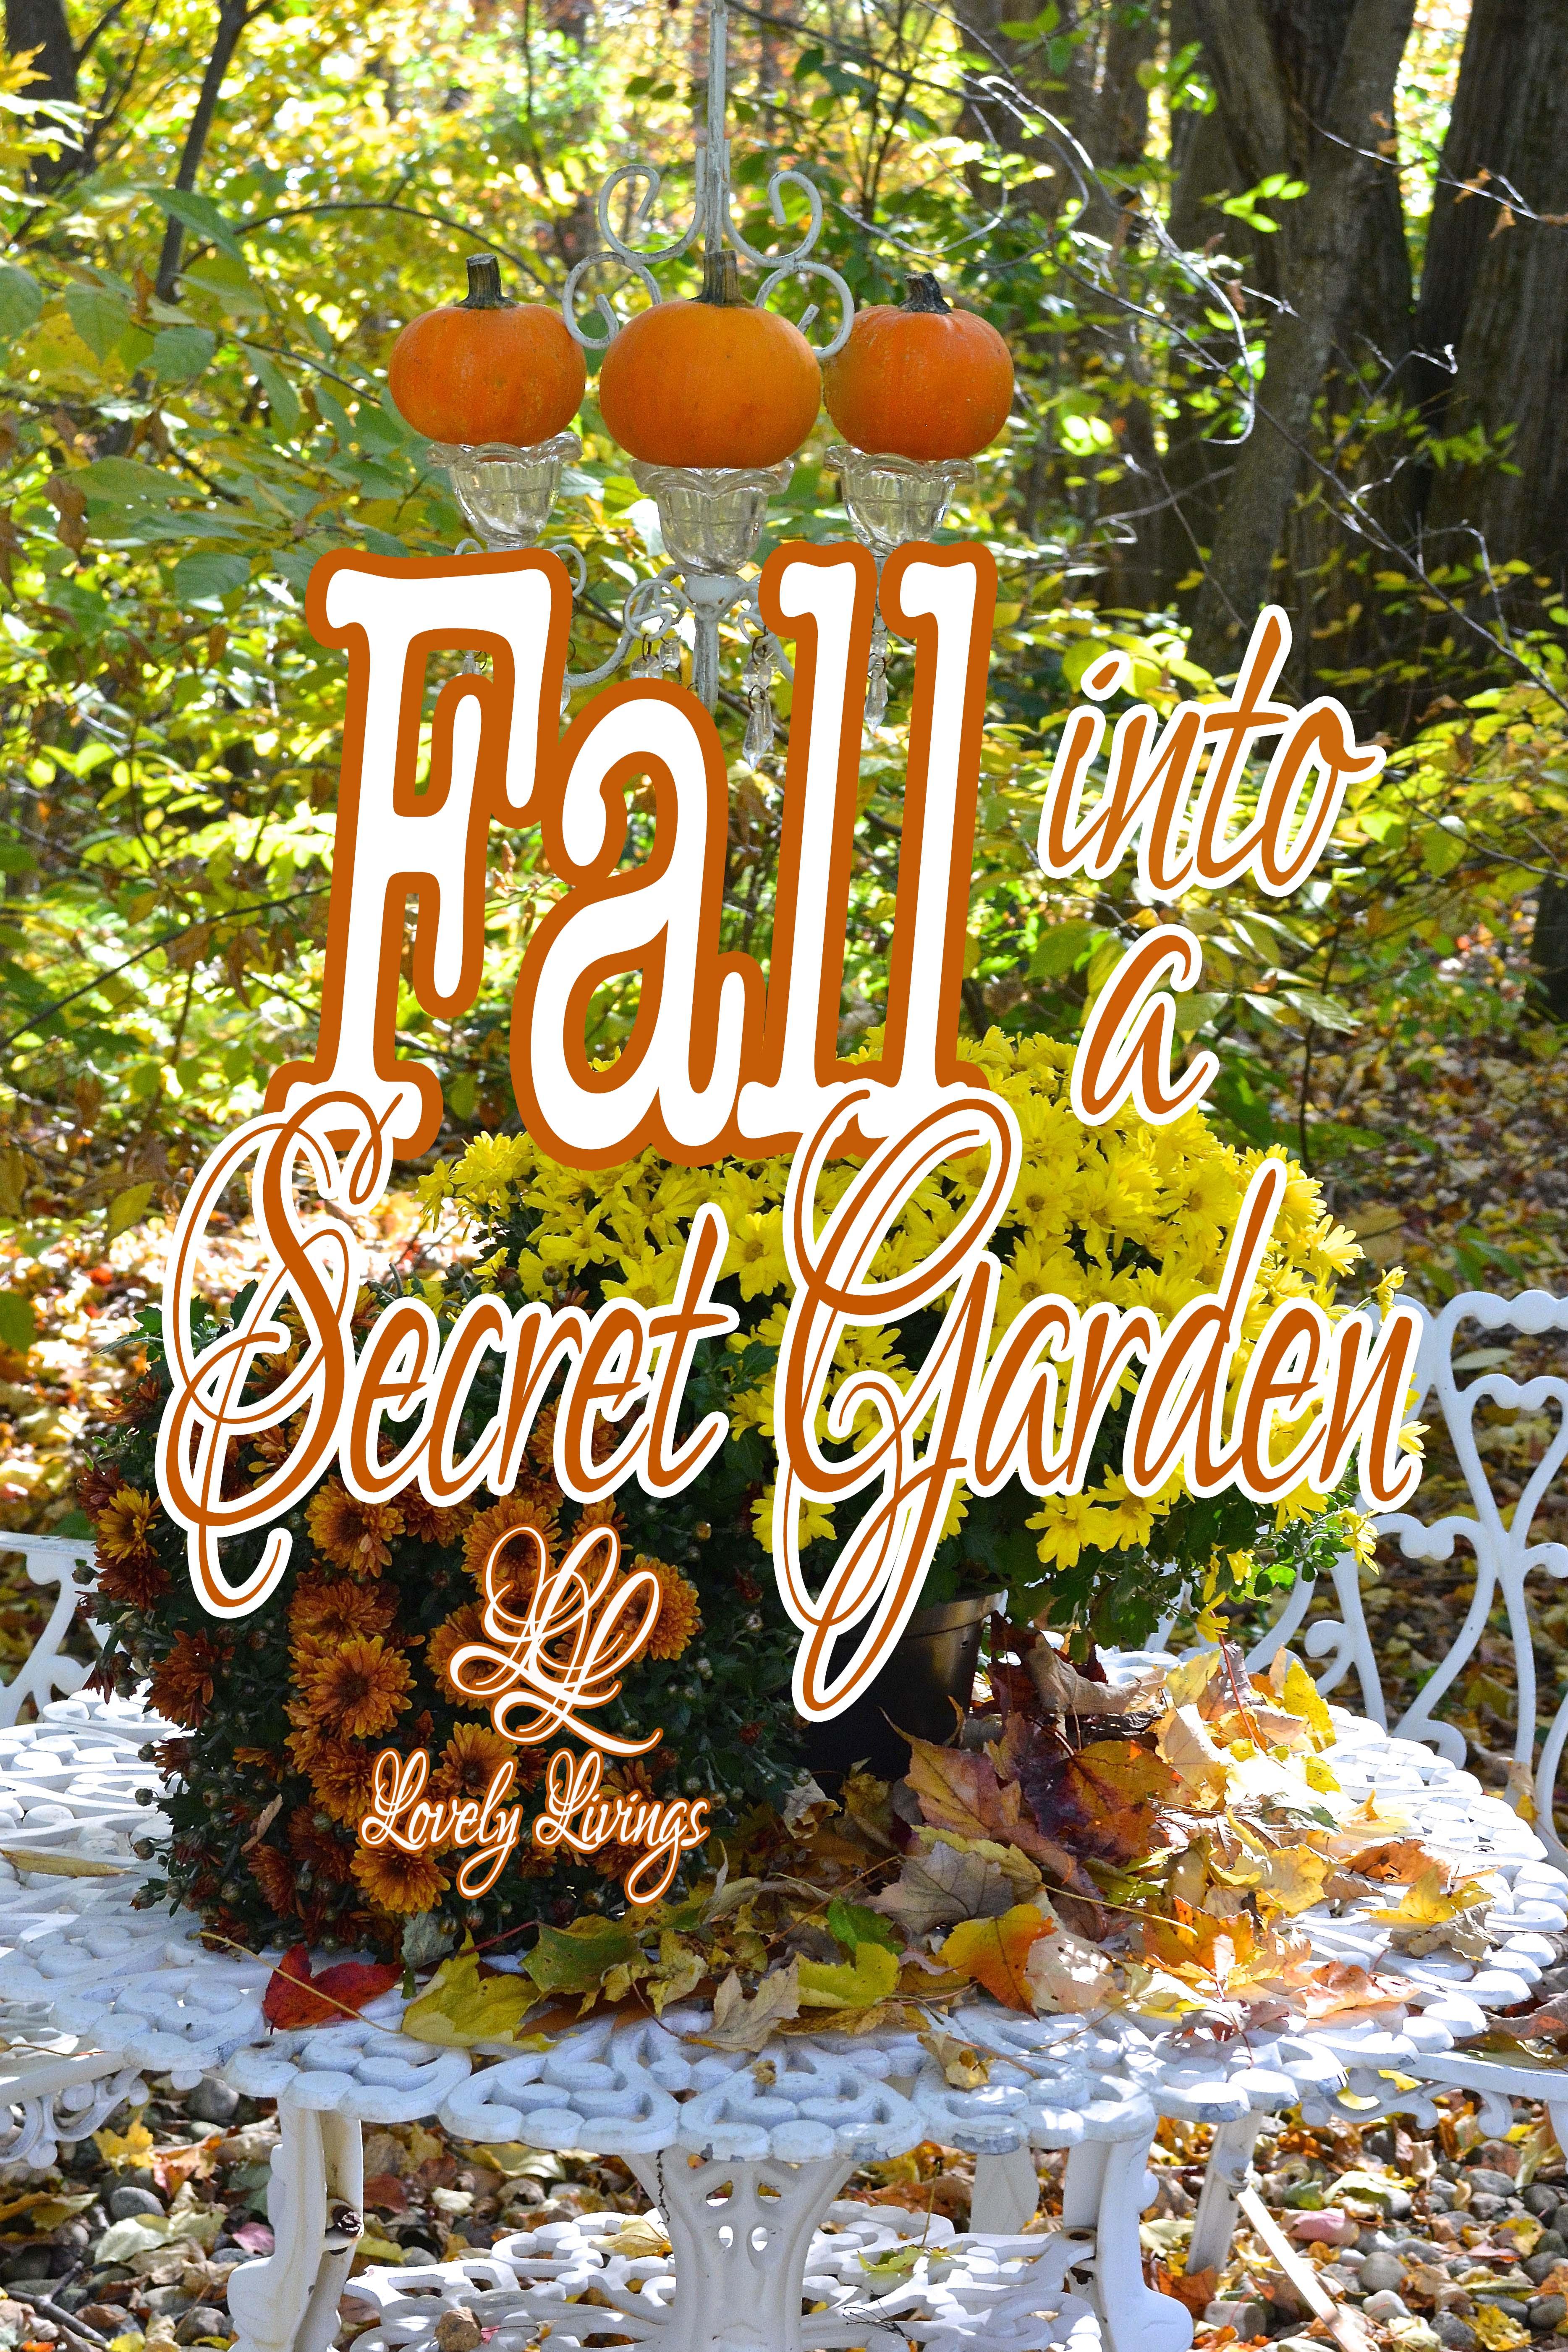 My Secret Garden: Fall Into A Secret Garden